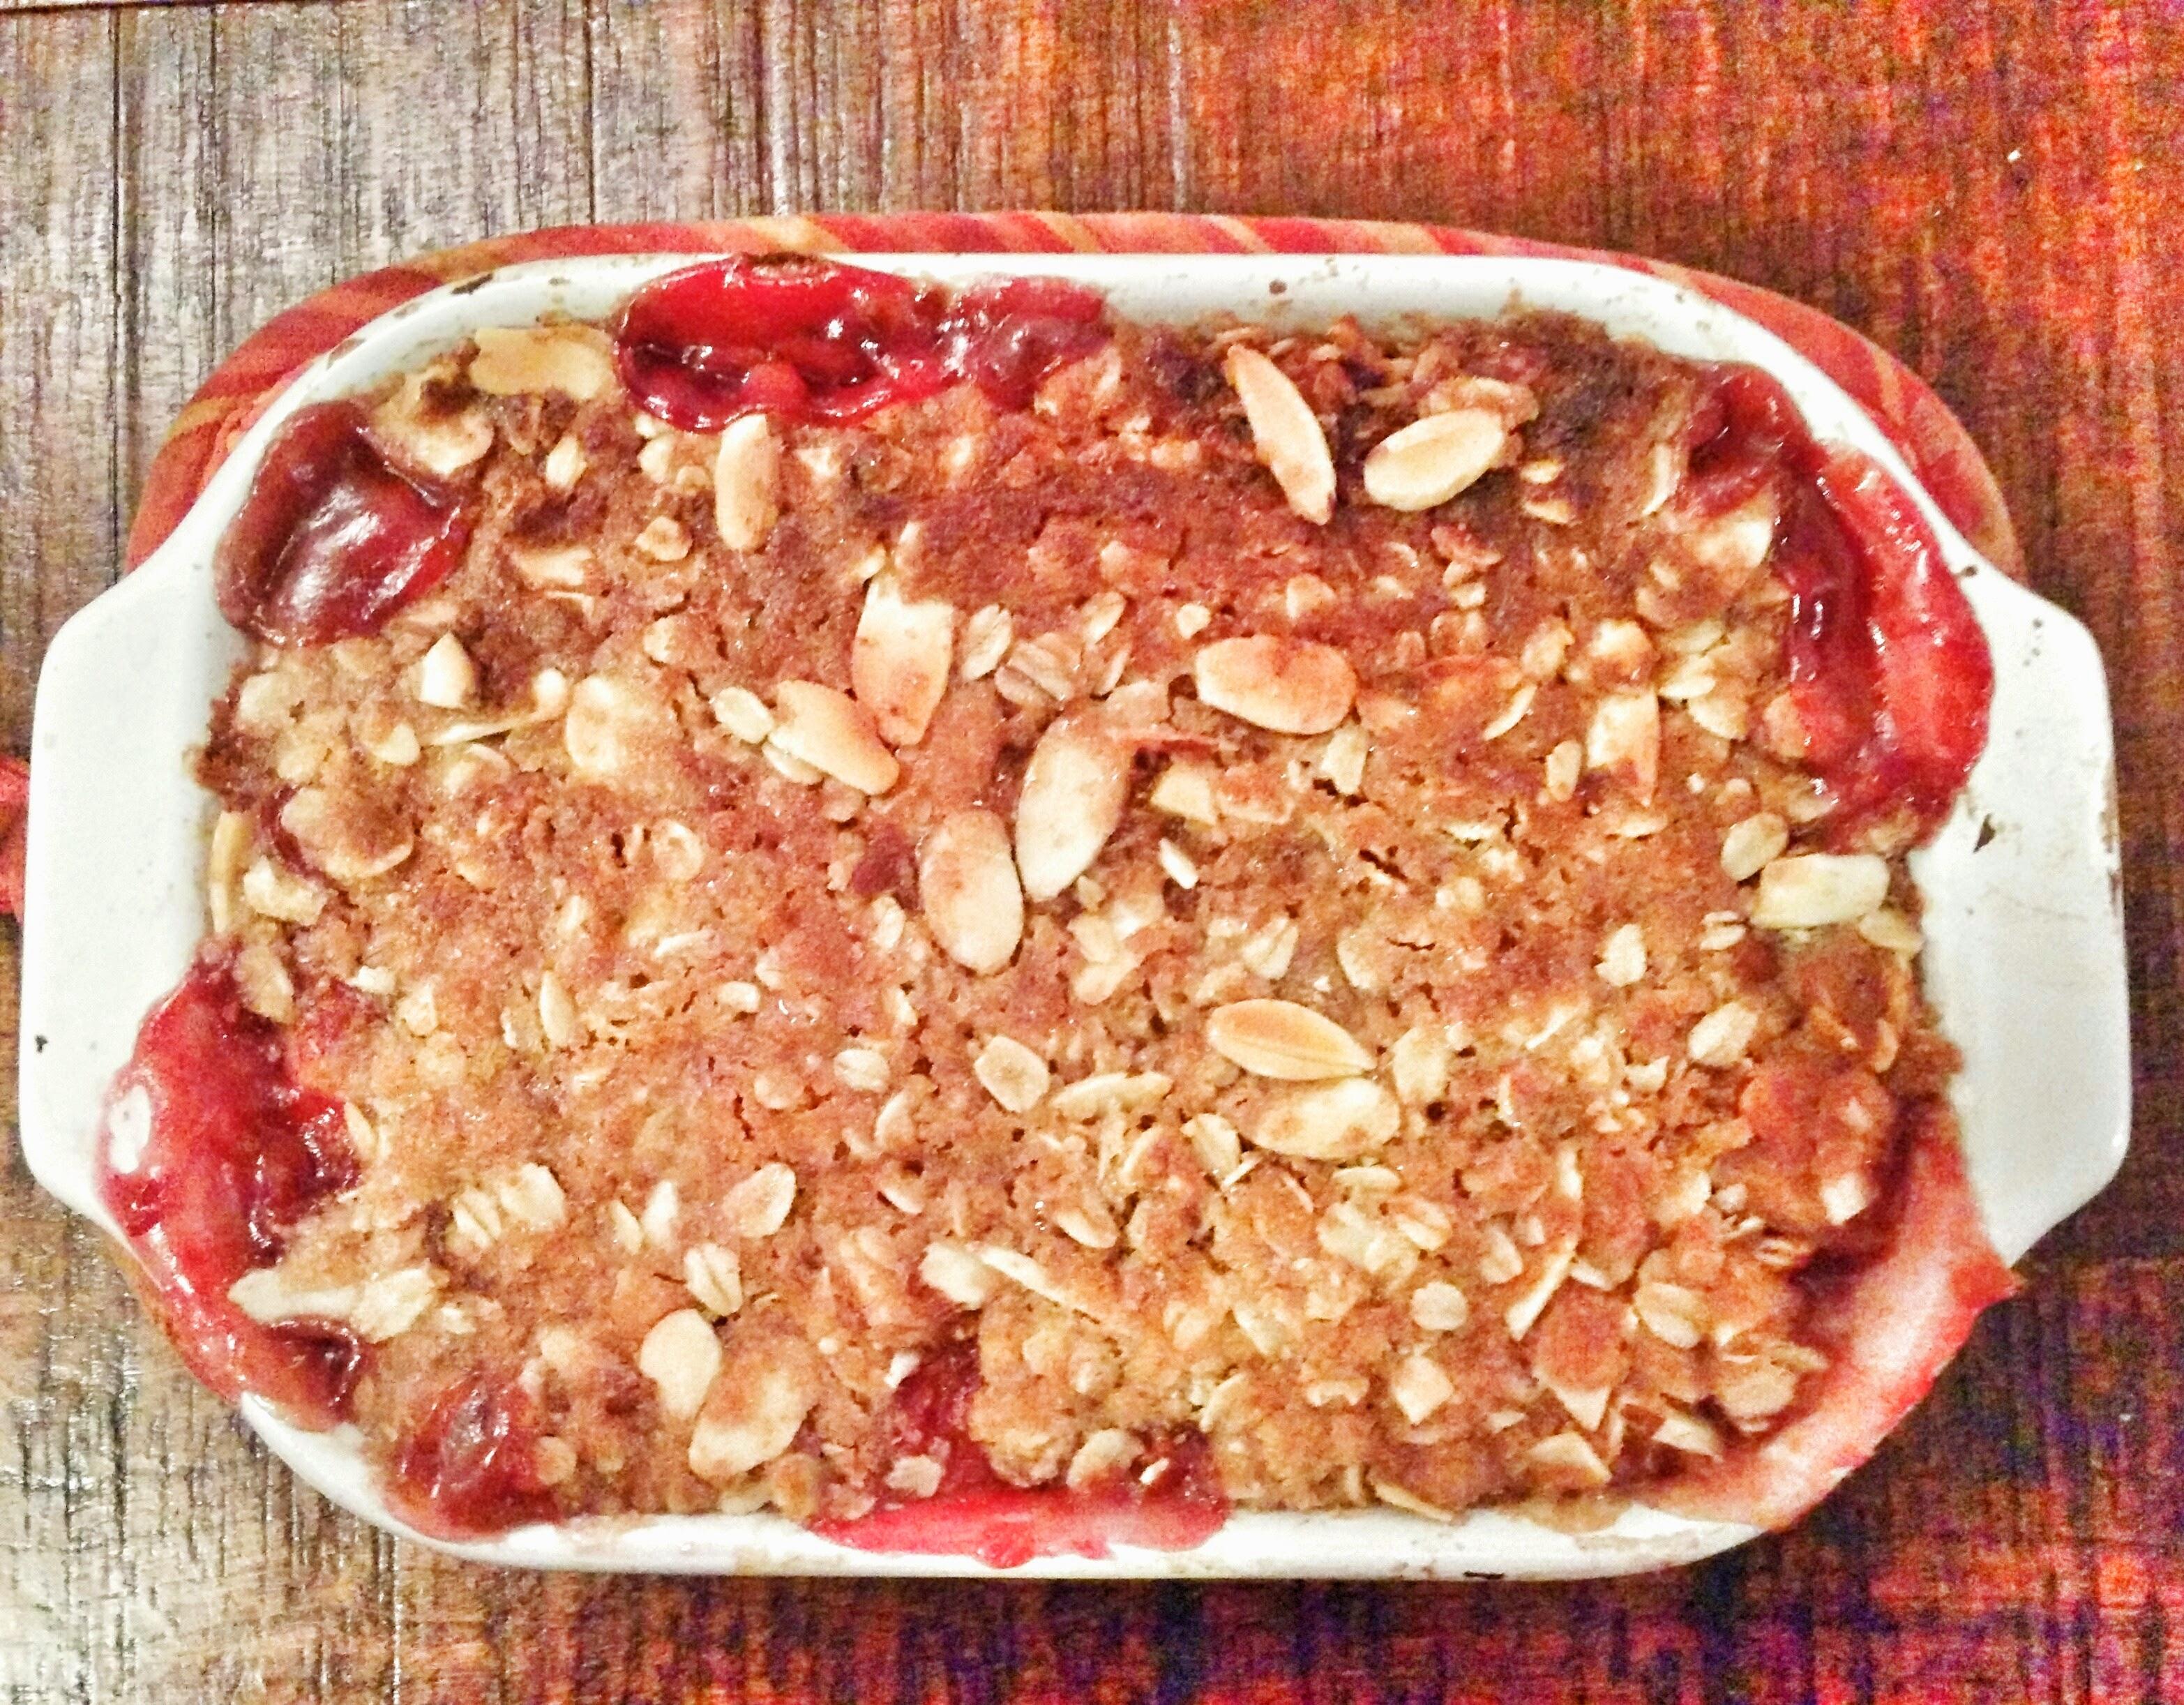 Easy Weeknight Rustic Peach Berry Crumble [Vegan]